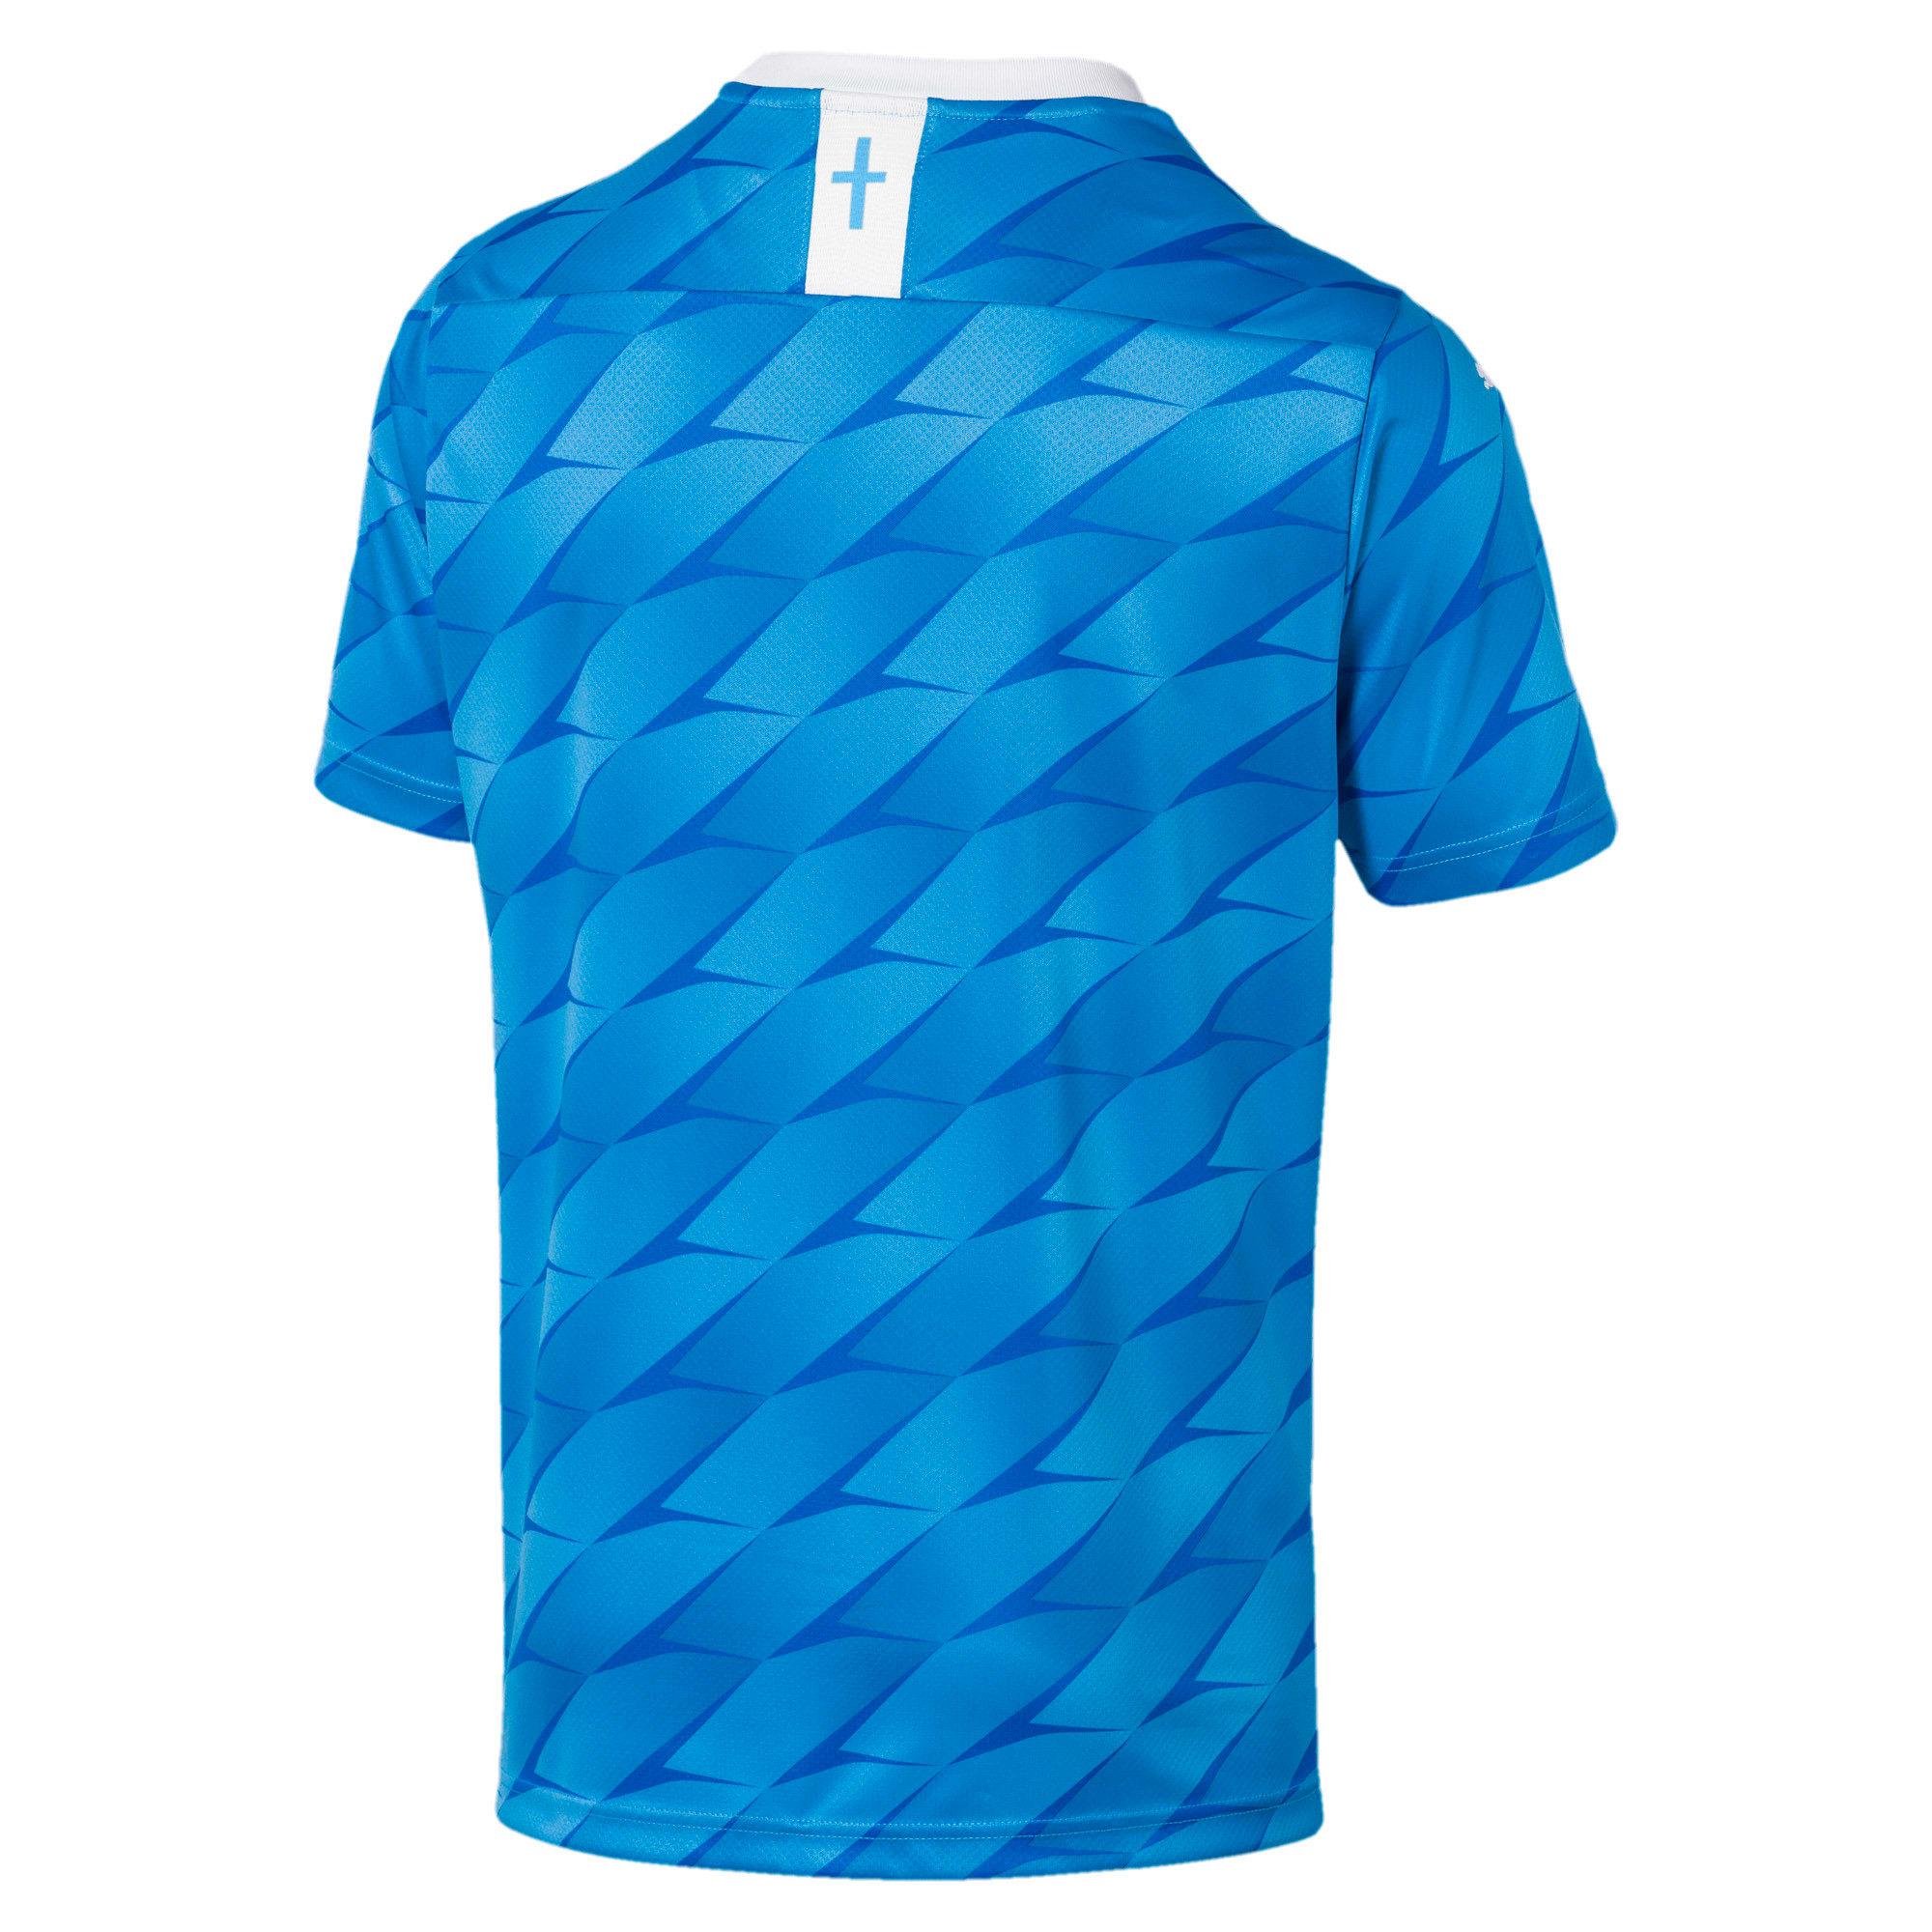 Miniatura 2 de Réplica de la camiseta de visitante delOlympique de Marseillepara hombre, Bleu Azur-Puma White, mediano